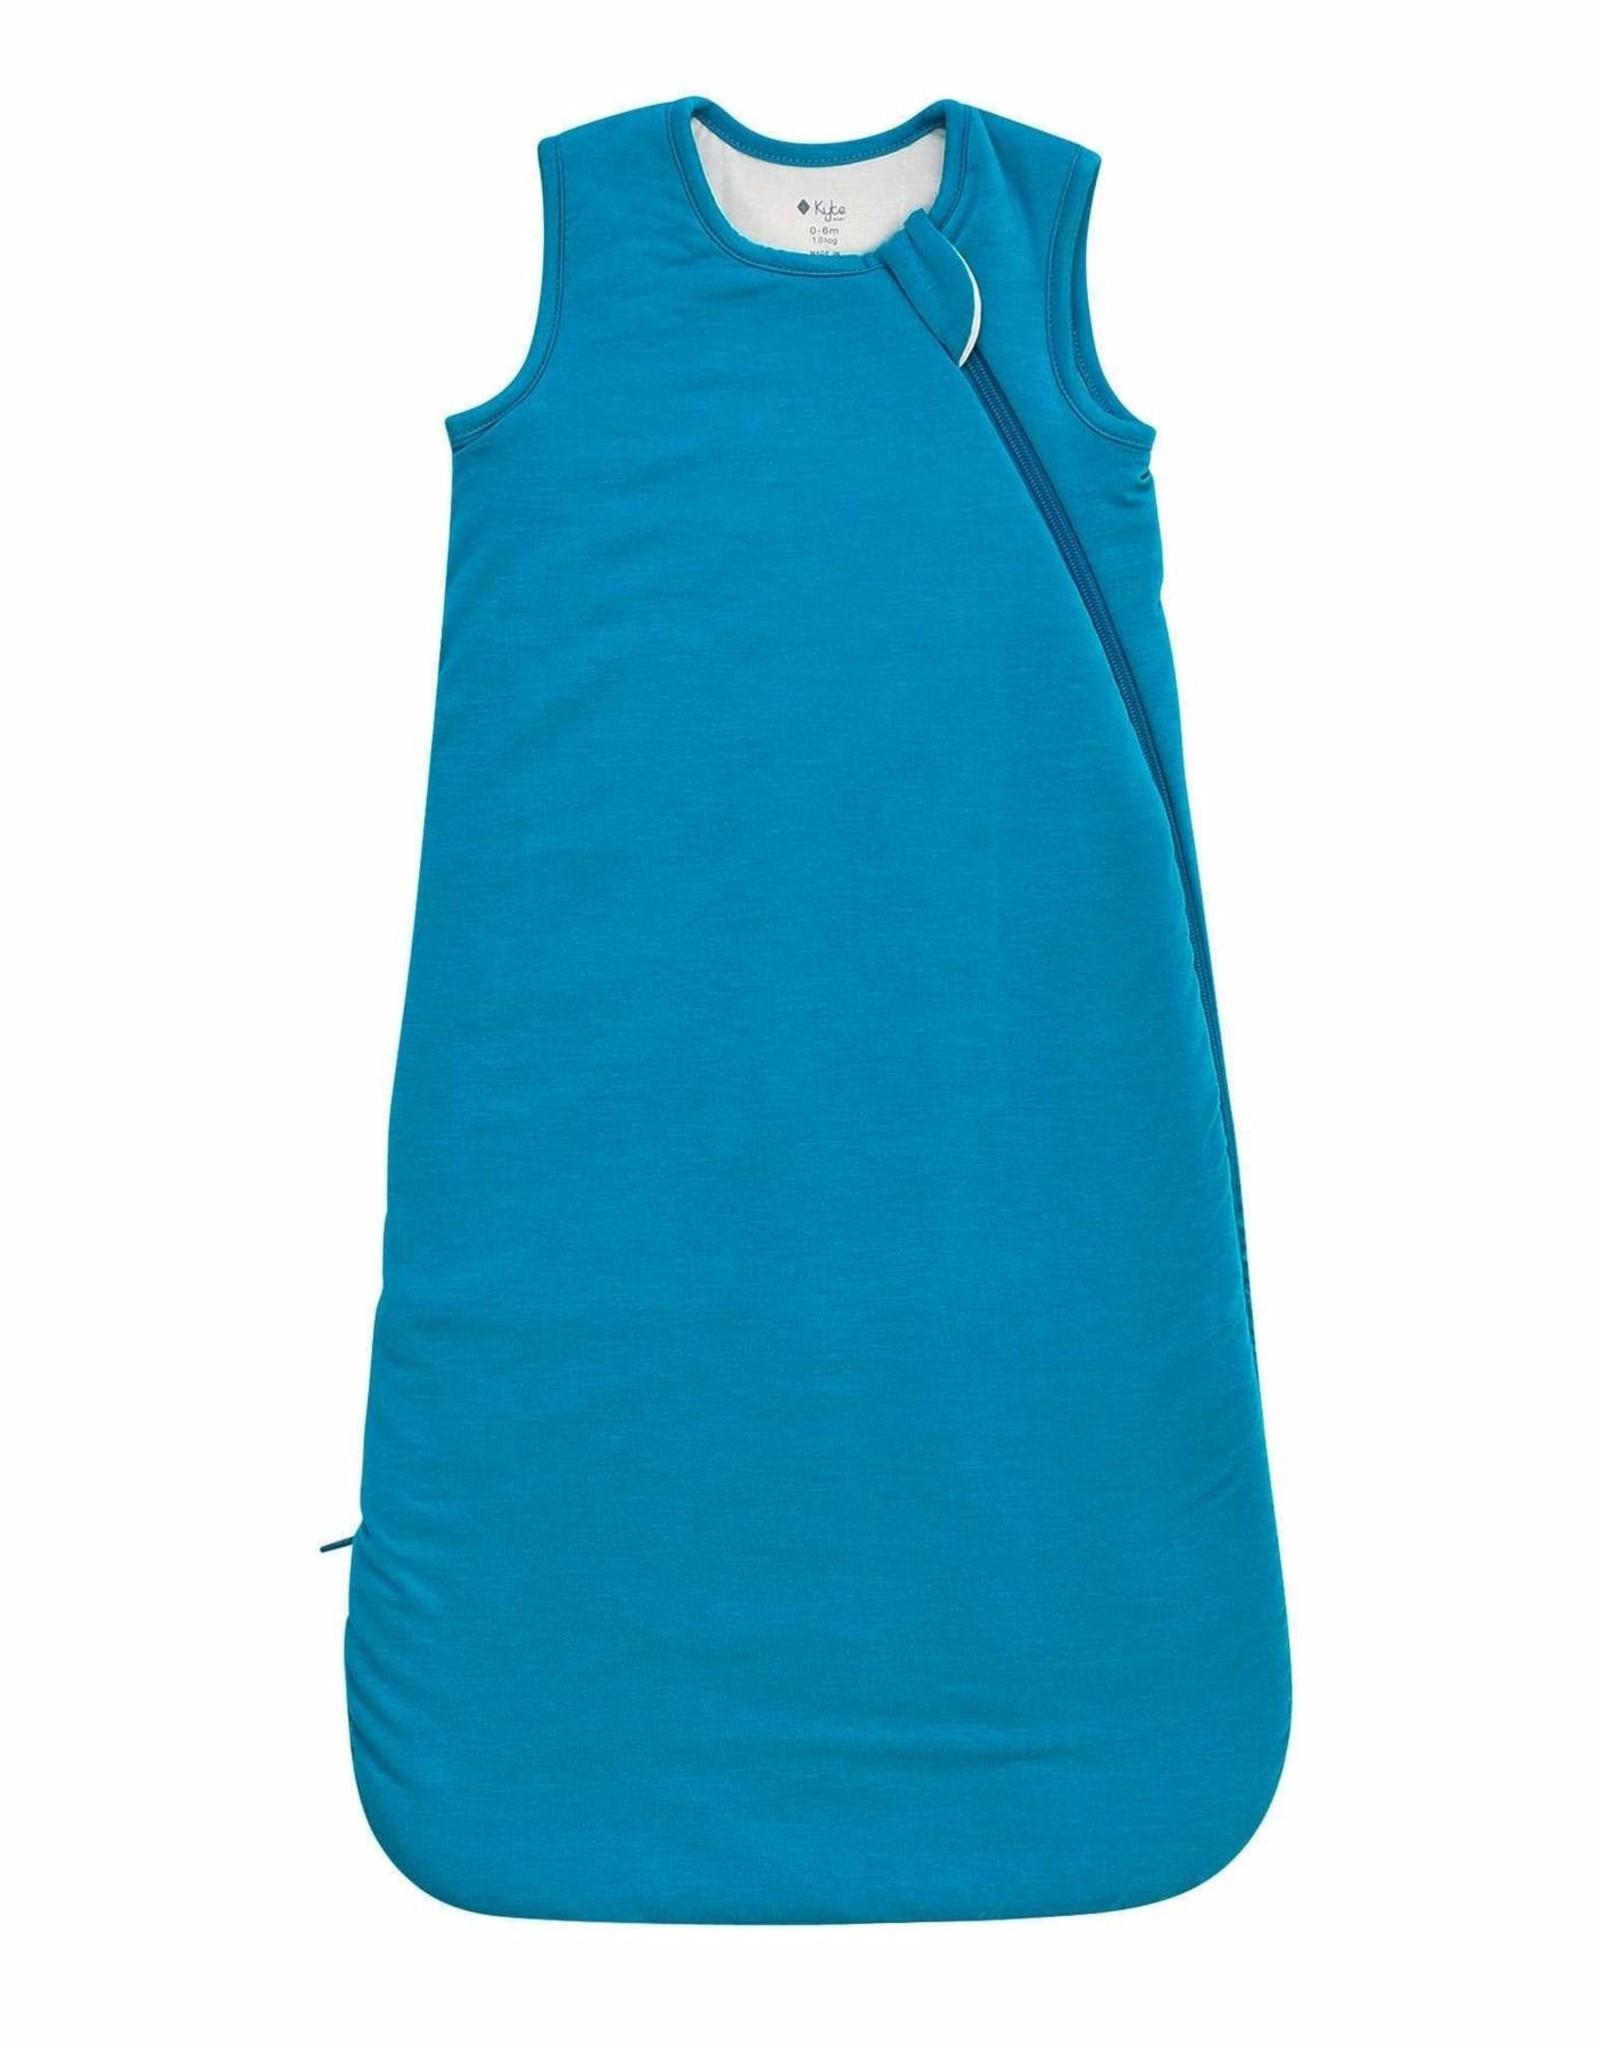 Kyte Baby sleep bag 1.0- lagoon